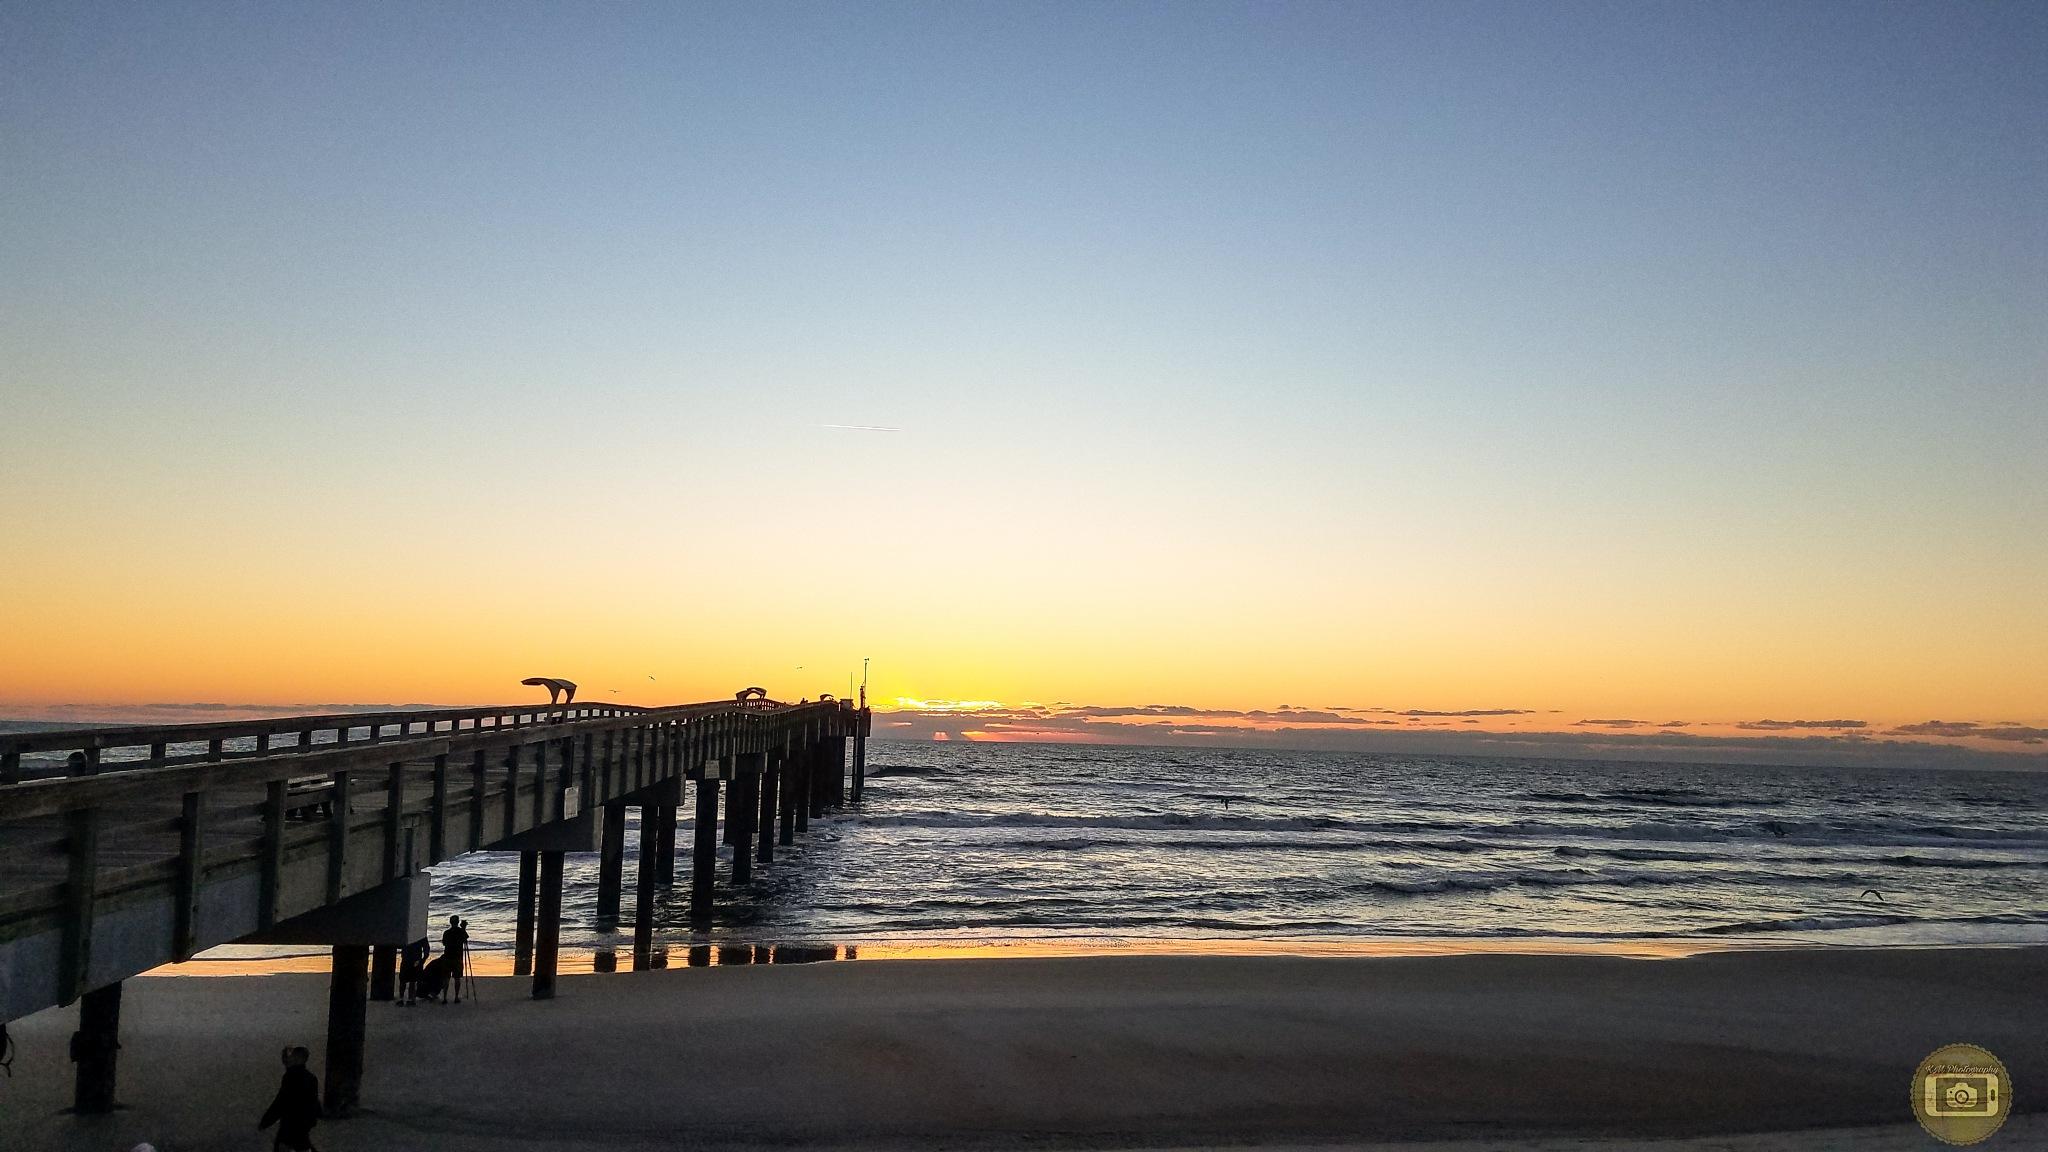 Sunrise at Saint Augustine Beach pier  by KMPhotography